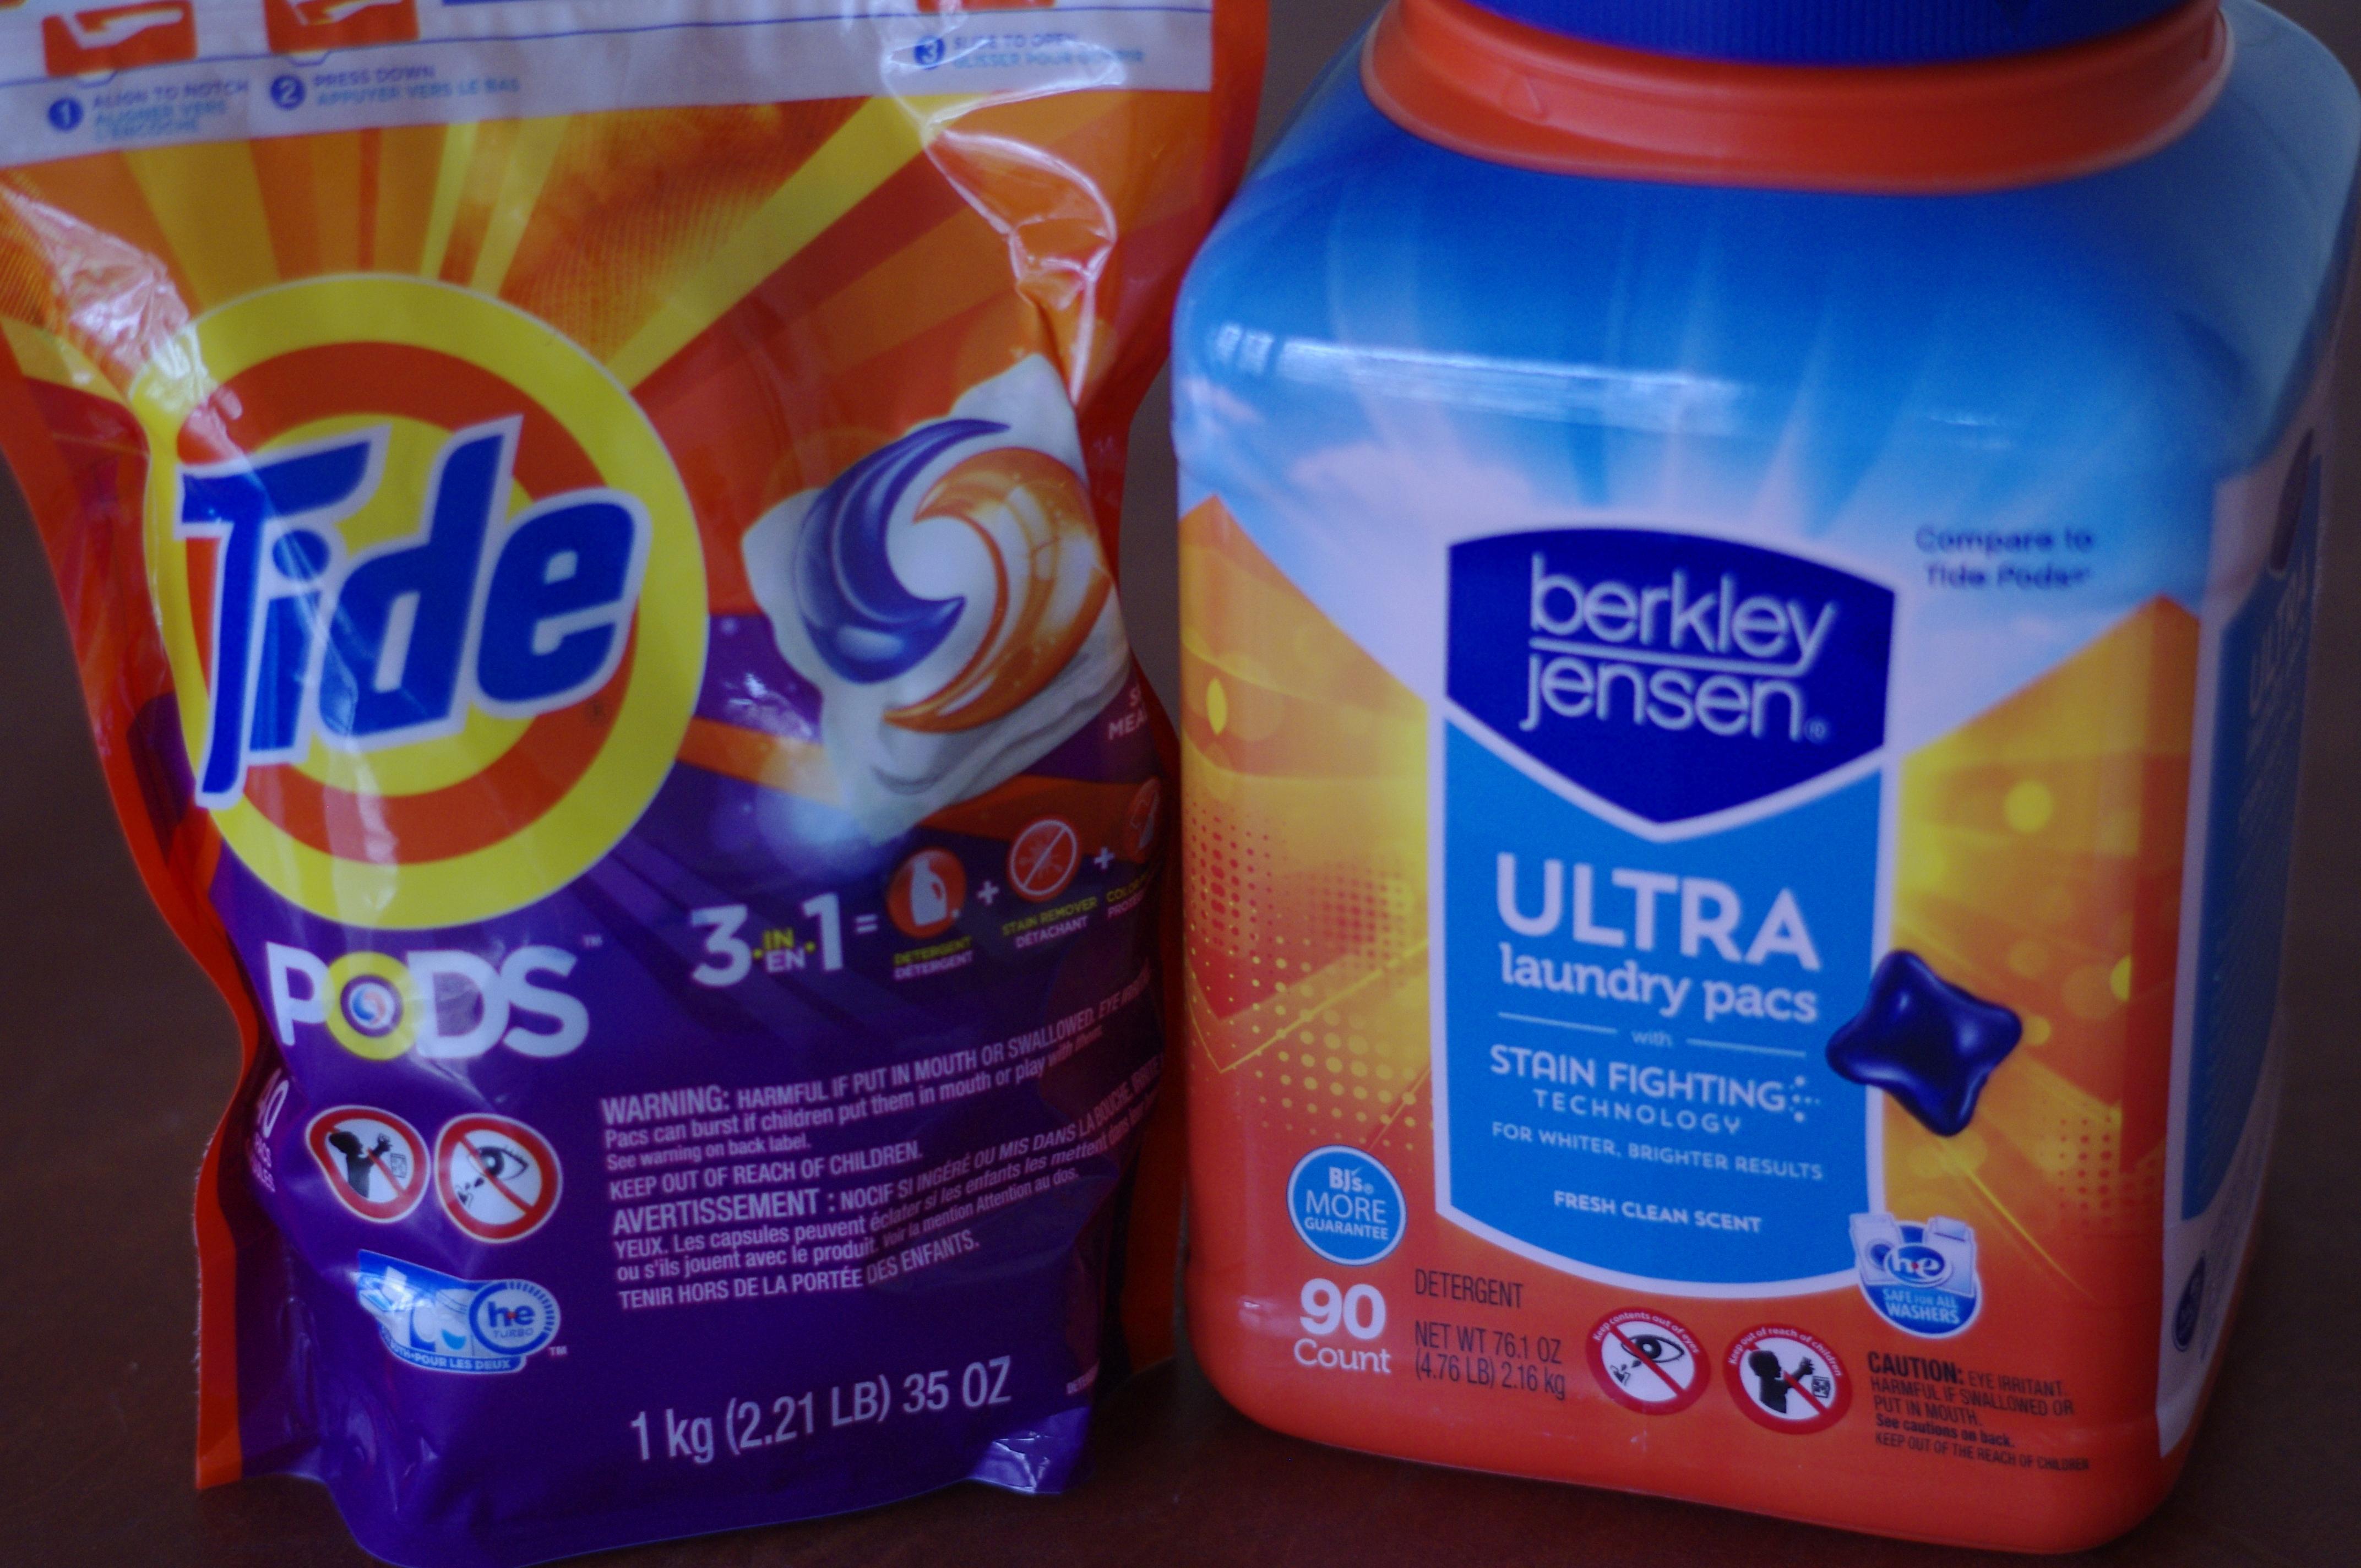 bjs brand laundry detergent tabs